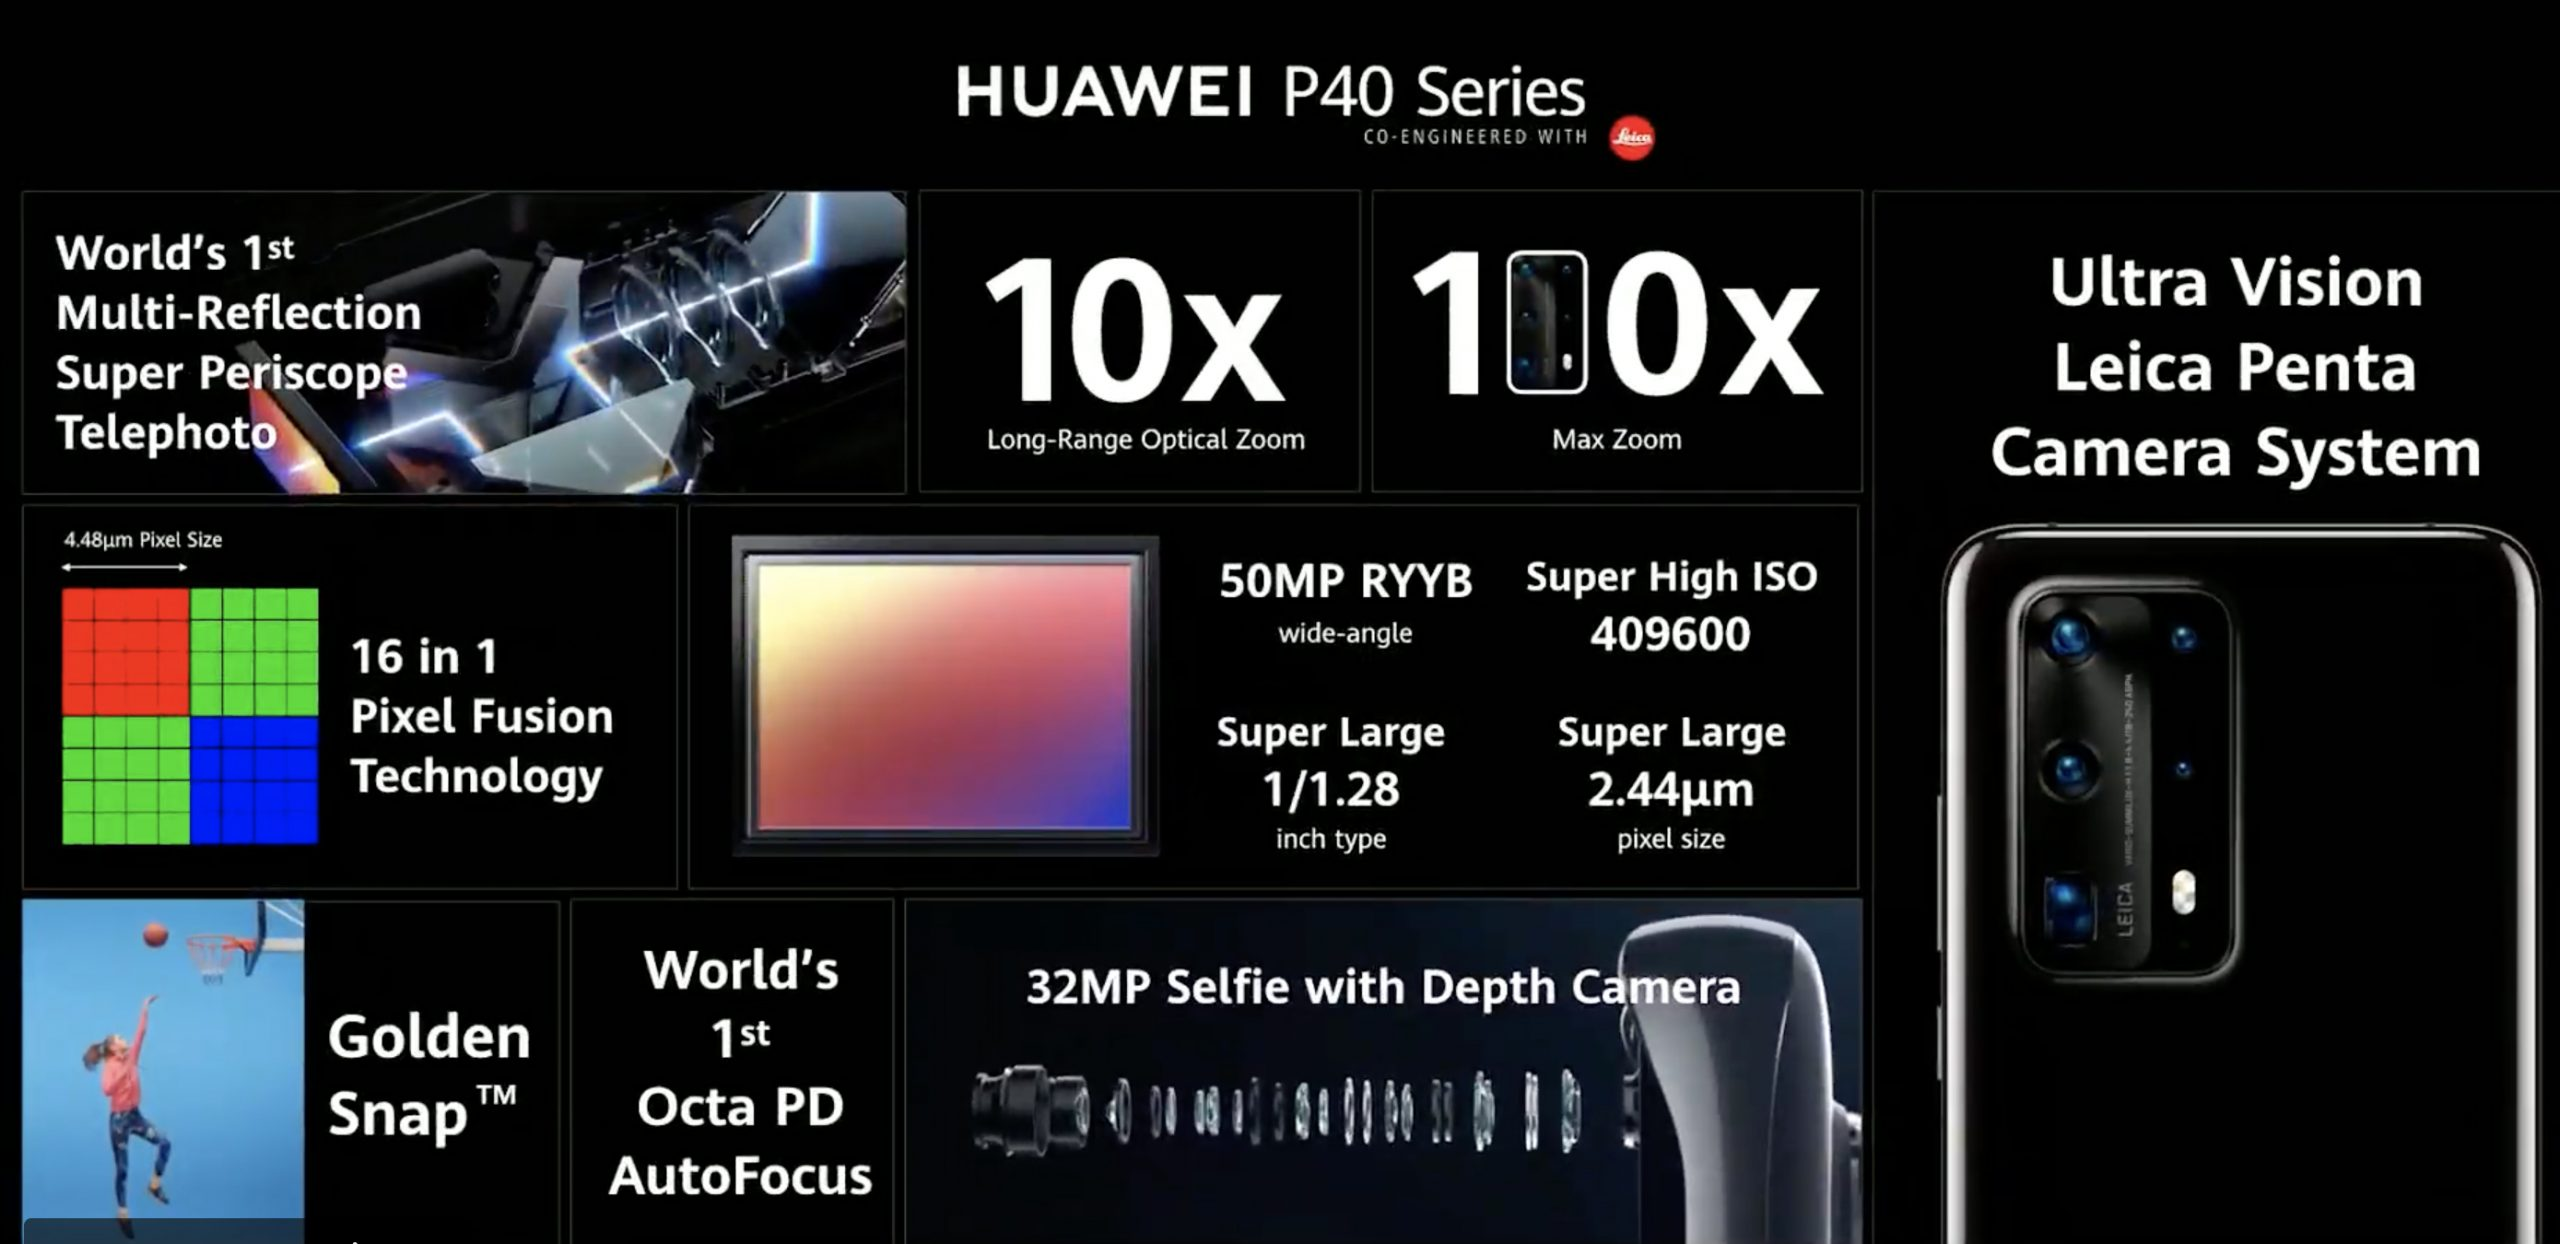 характеристики камеры Huawei P40 Pro Plus